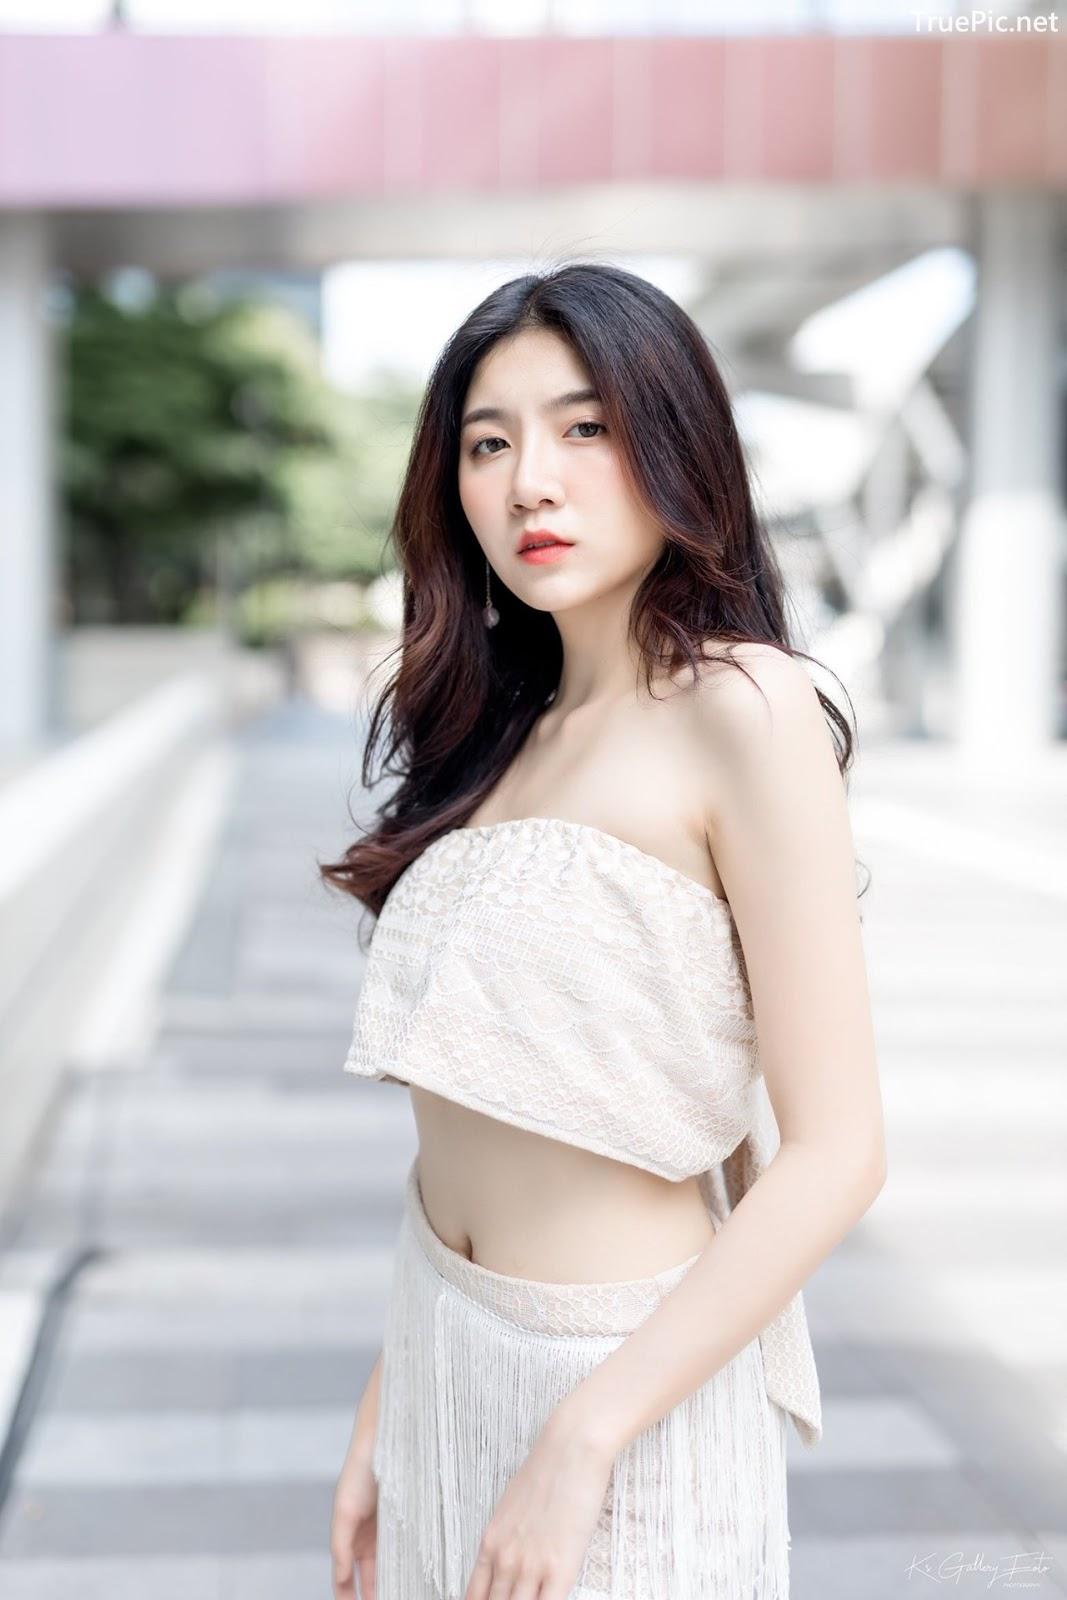 Image Thailand Model - Sasi Ngiunwan - At CentralPlaza Lardprao - TruePic.net - Picture-2